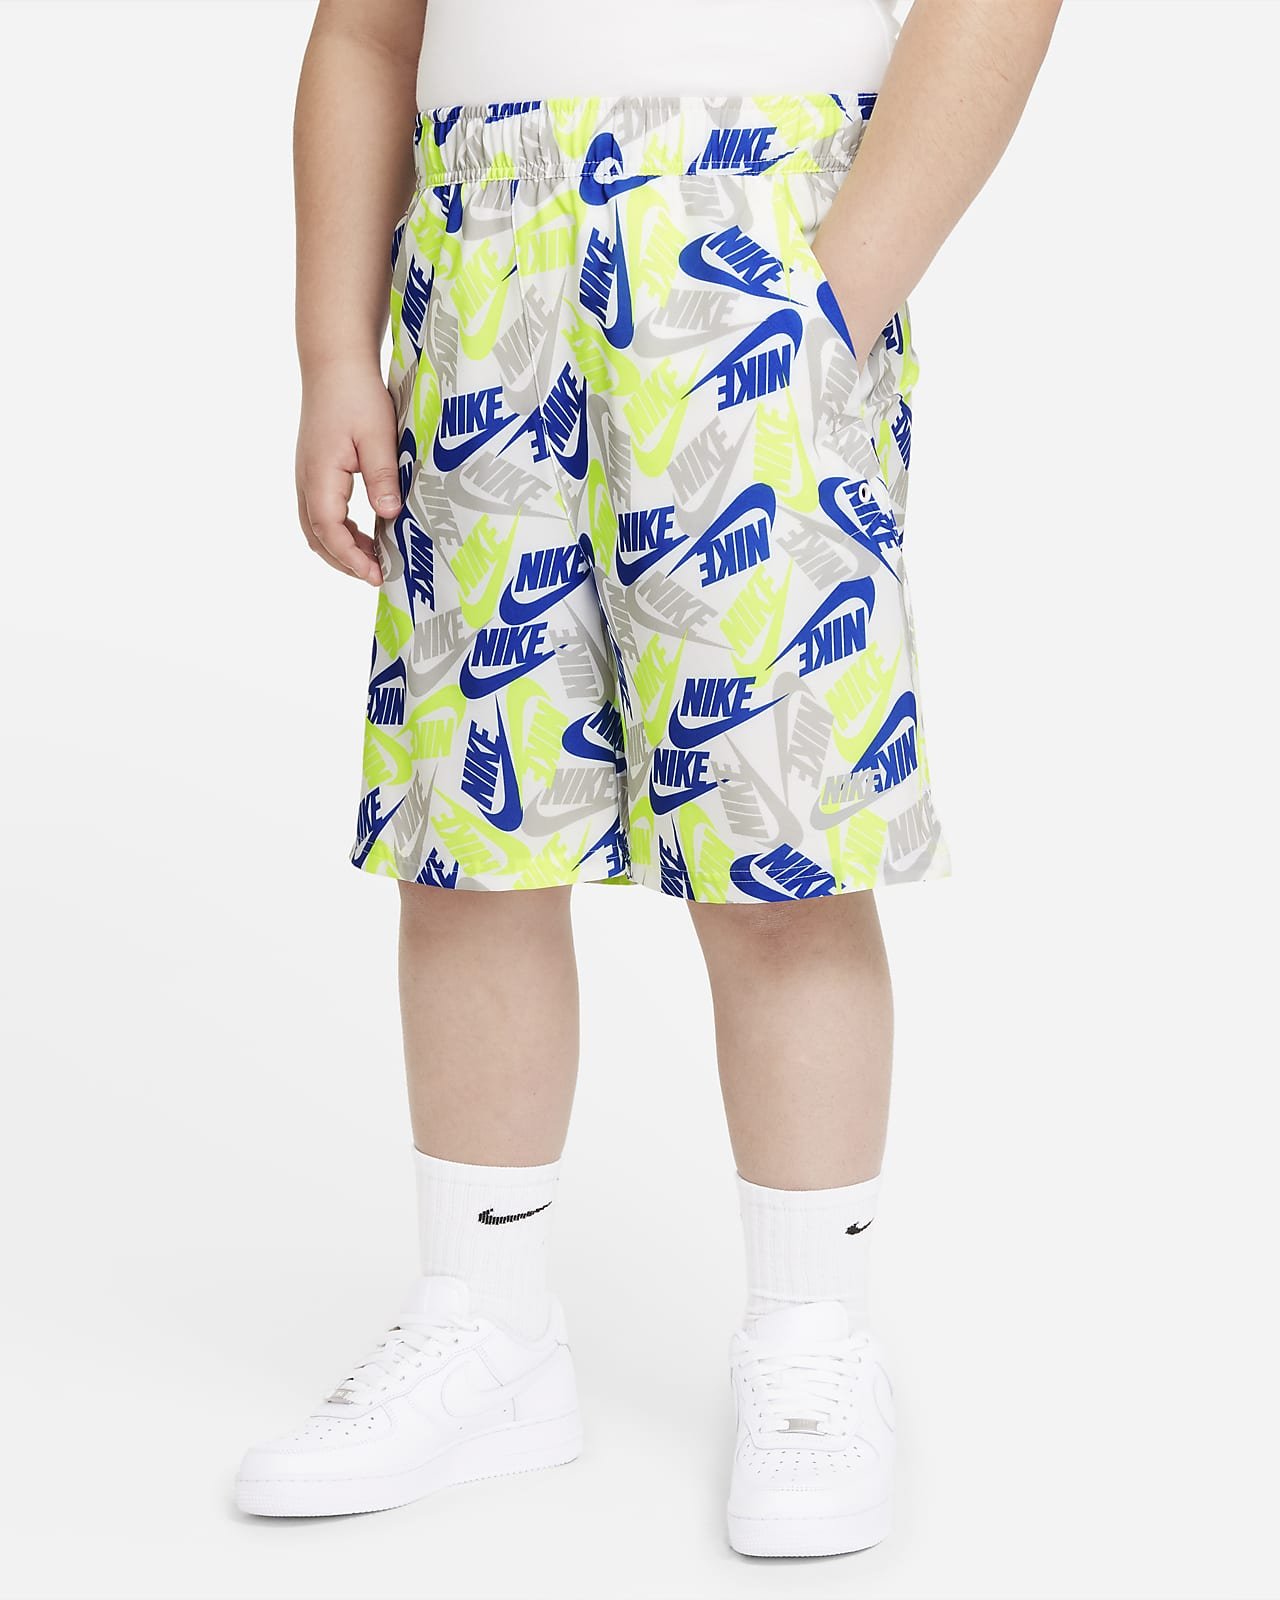 Nike Sportswear Big Kids' (Boys') Woven Printed Shorts (Extended Size)